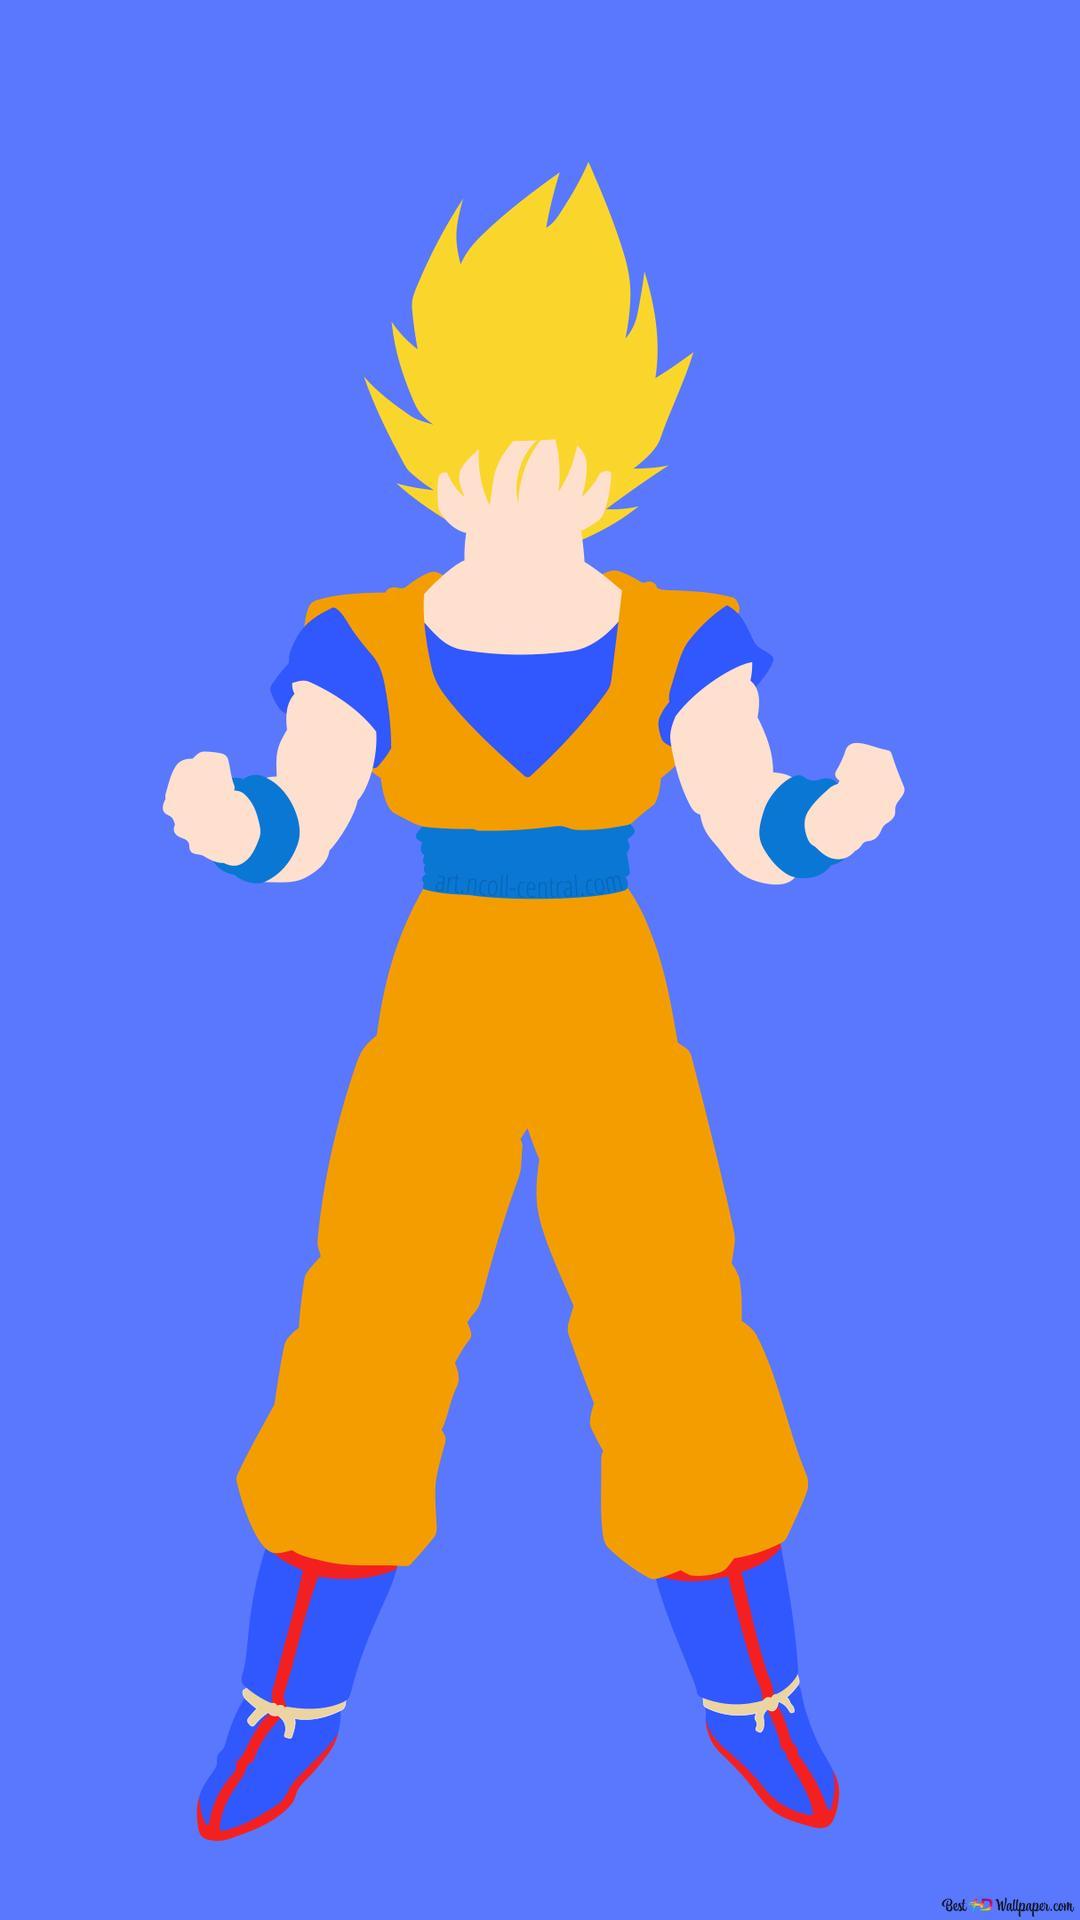 Goku The Super Saiyan Of Dragon Ball Z Hd Wallpaper Download